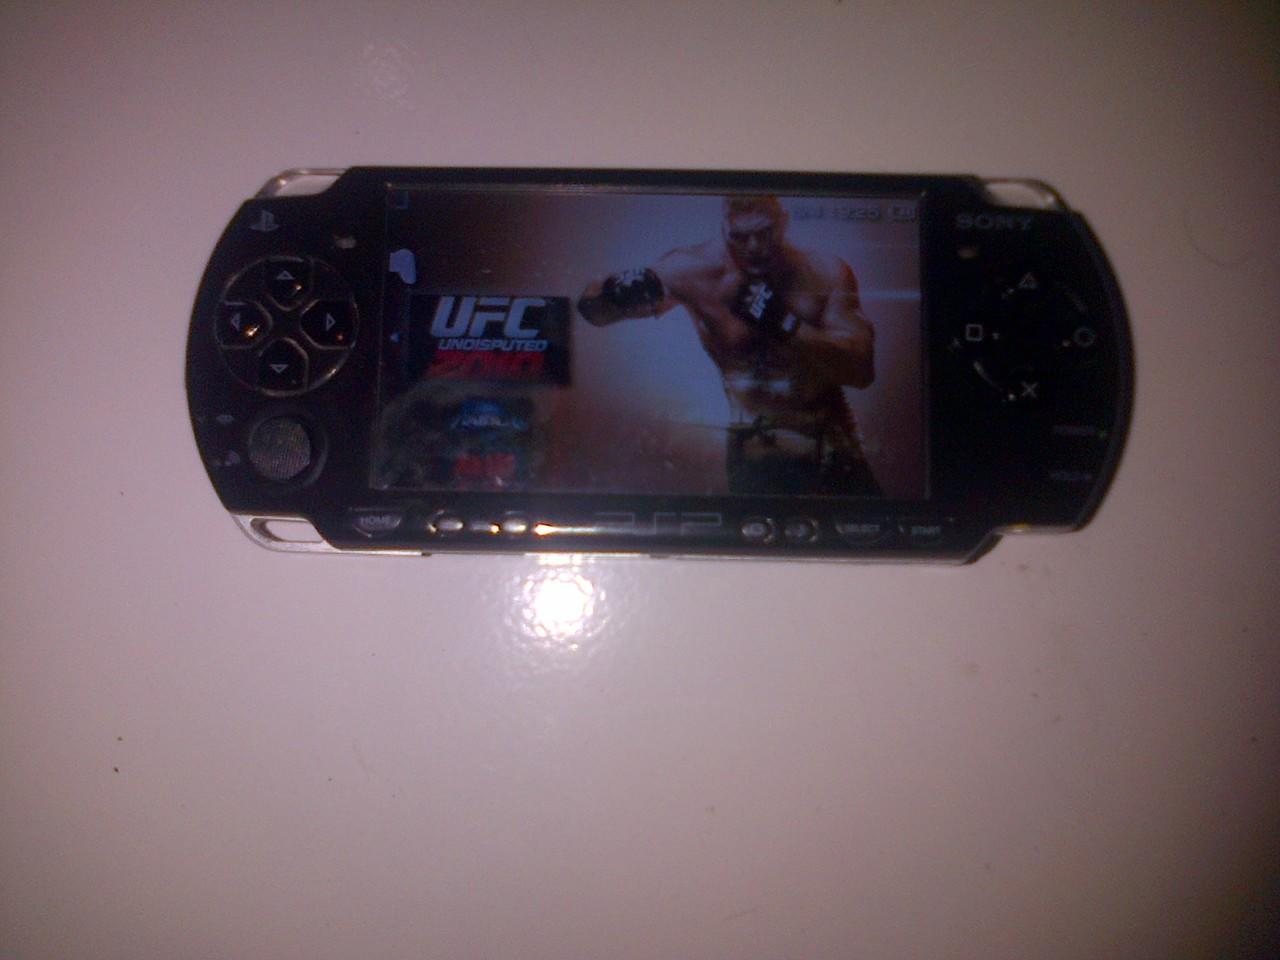 JUAL PSP 3000 MALANG